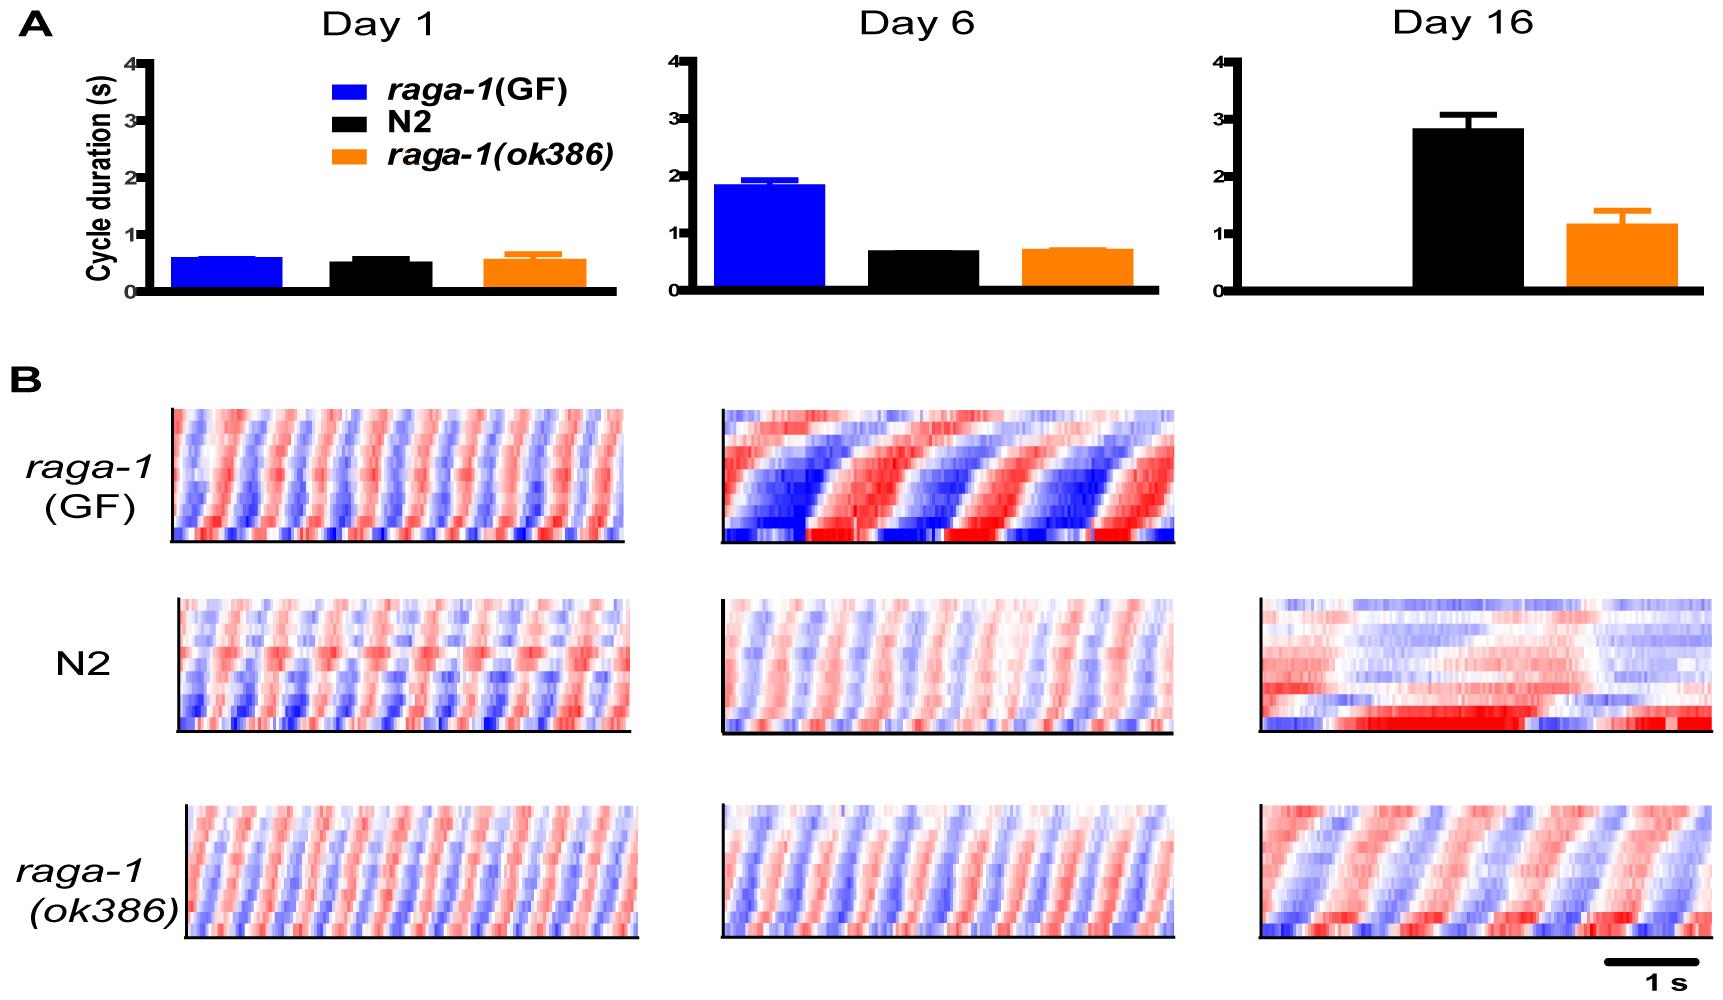 Comparison of swimming in aging <i>raga-1(ok386)</i>, transgenic <i>raga-1</i>(GF), and wild-type animals.